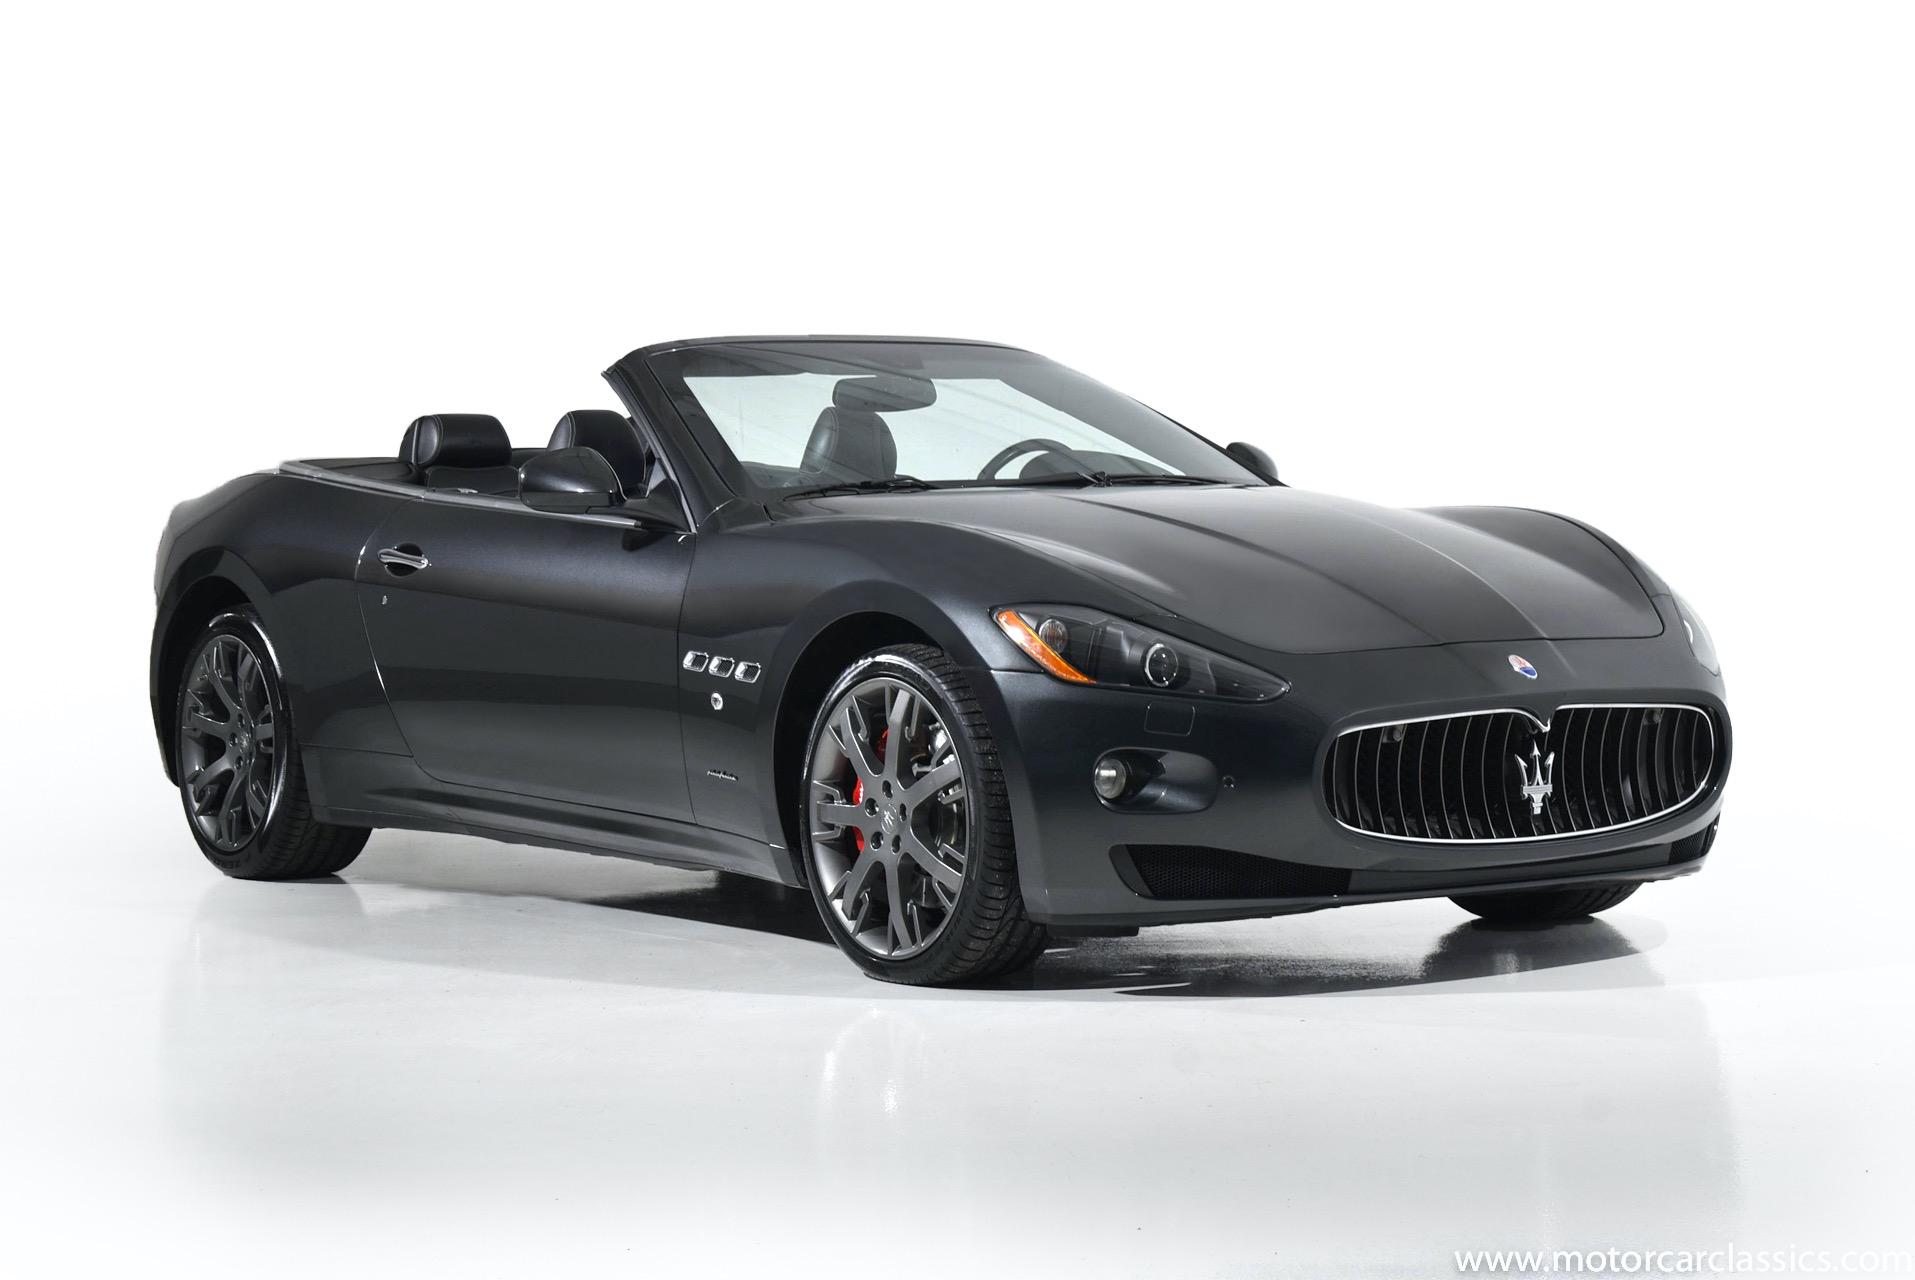 Used 2011 Maserati GranTurismo S | Farmingdale, NY